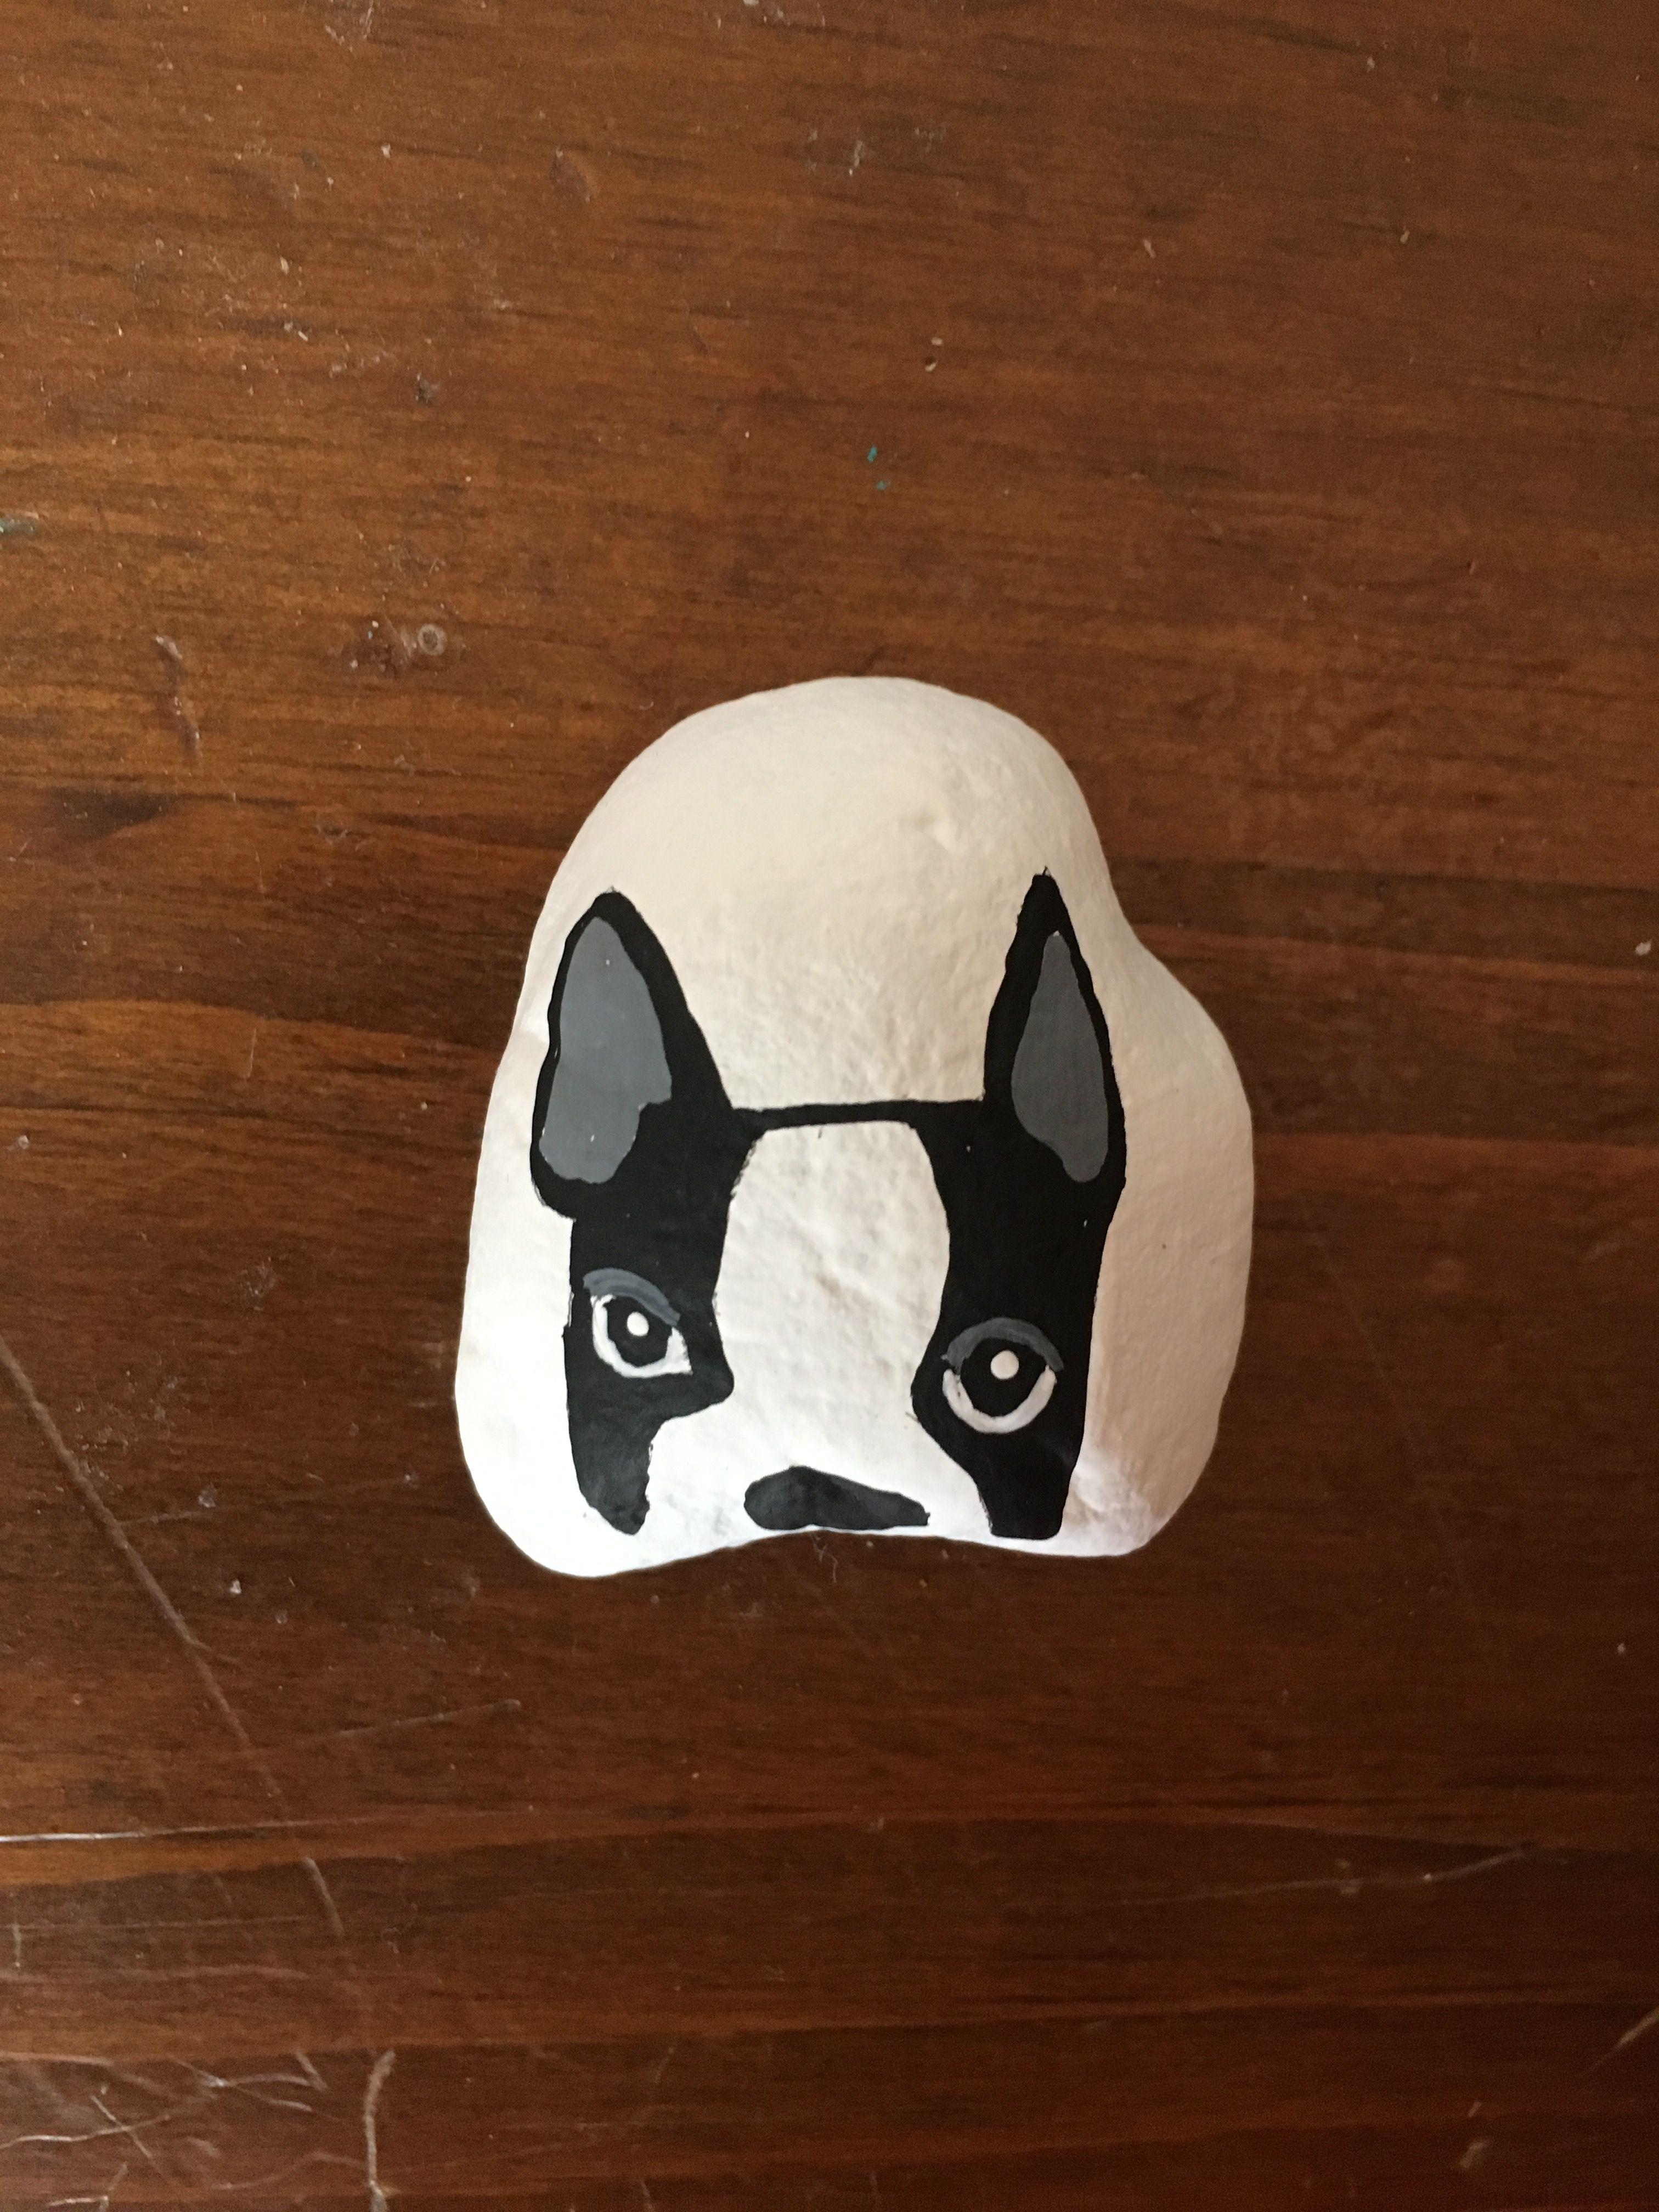 Boston Terrier Painted Rock Dogs Boston Terrier Art Boston Terrier Painting Rock Painting Designs